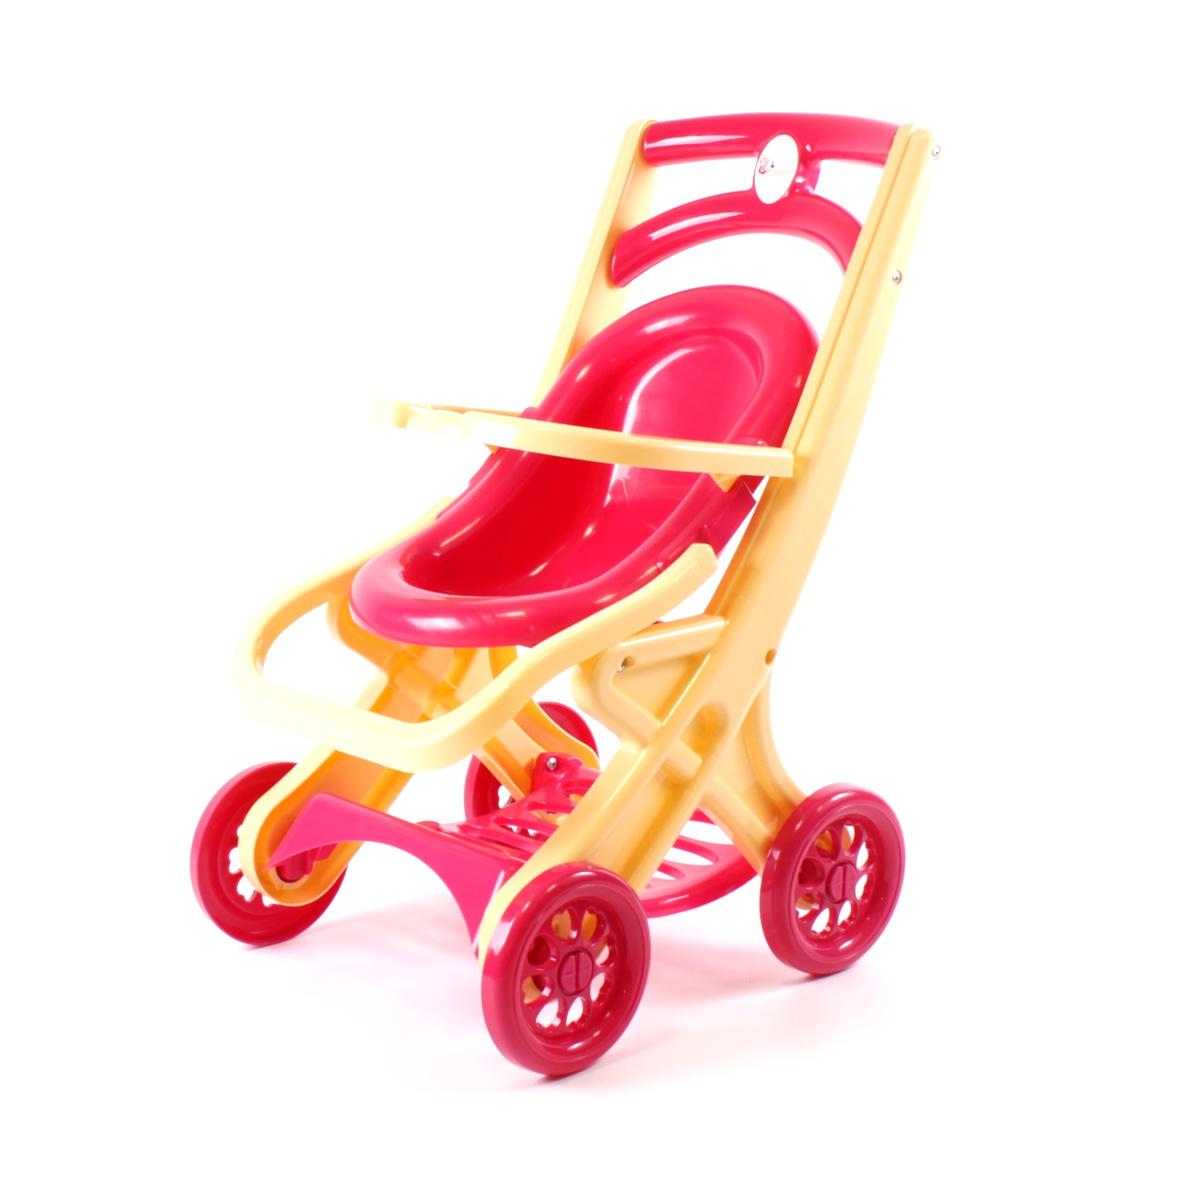 Транспорт для кукол Doloni Коляска для кукол, 0122/01 красный, бежевый